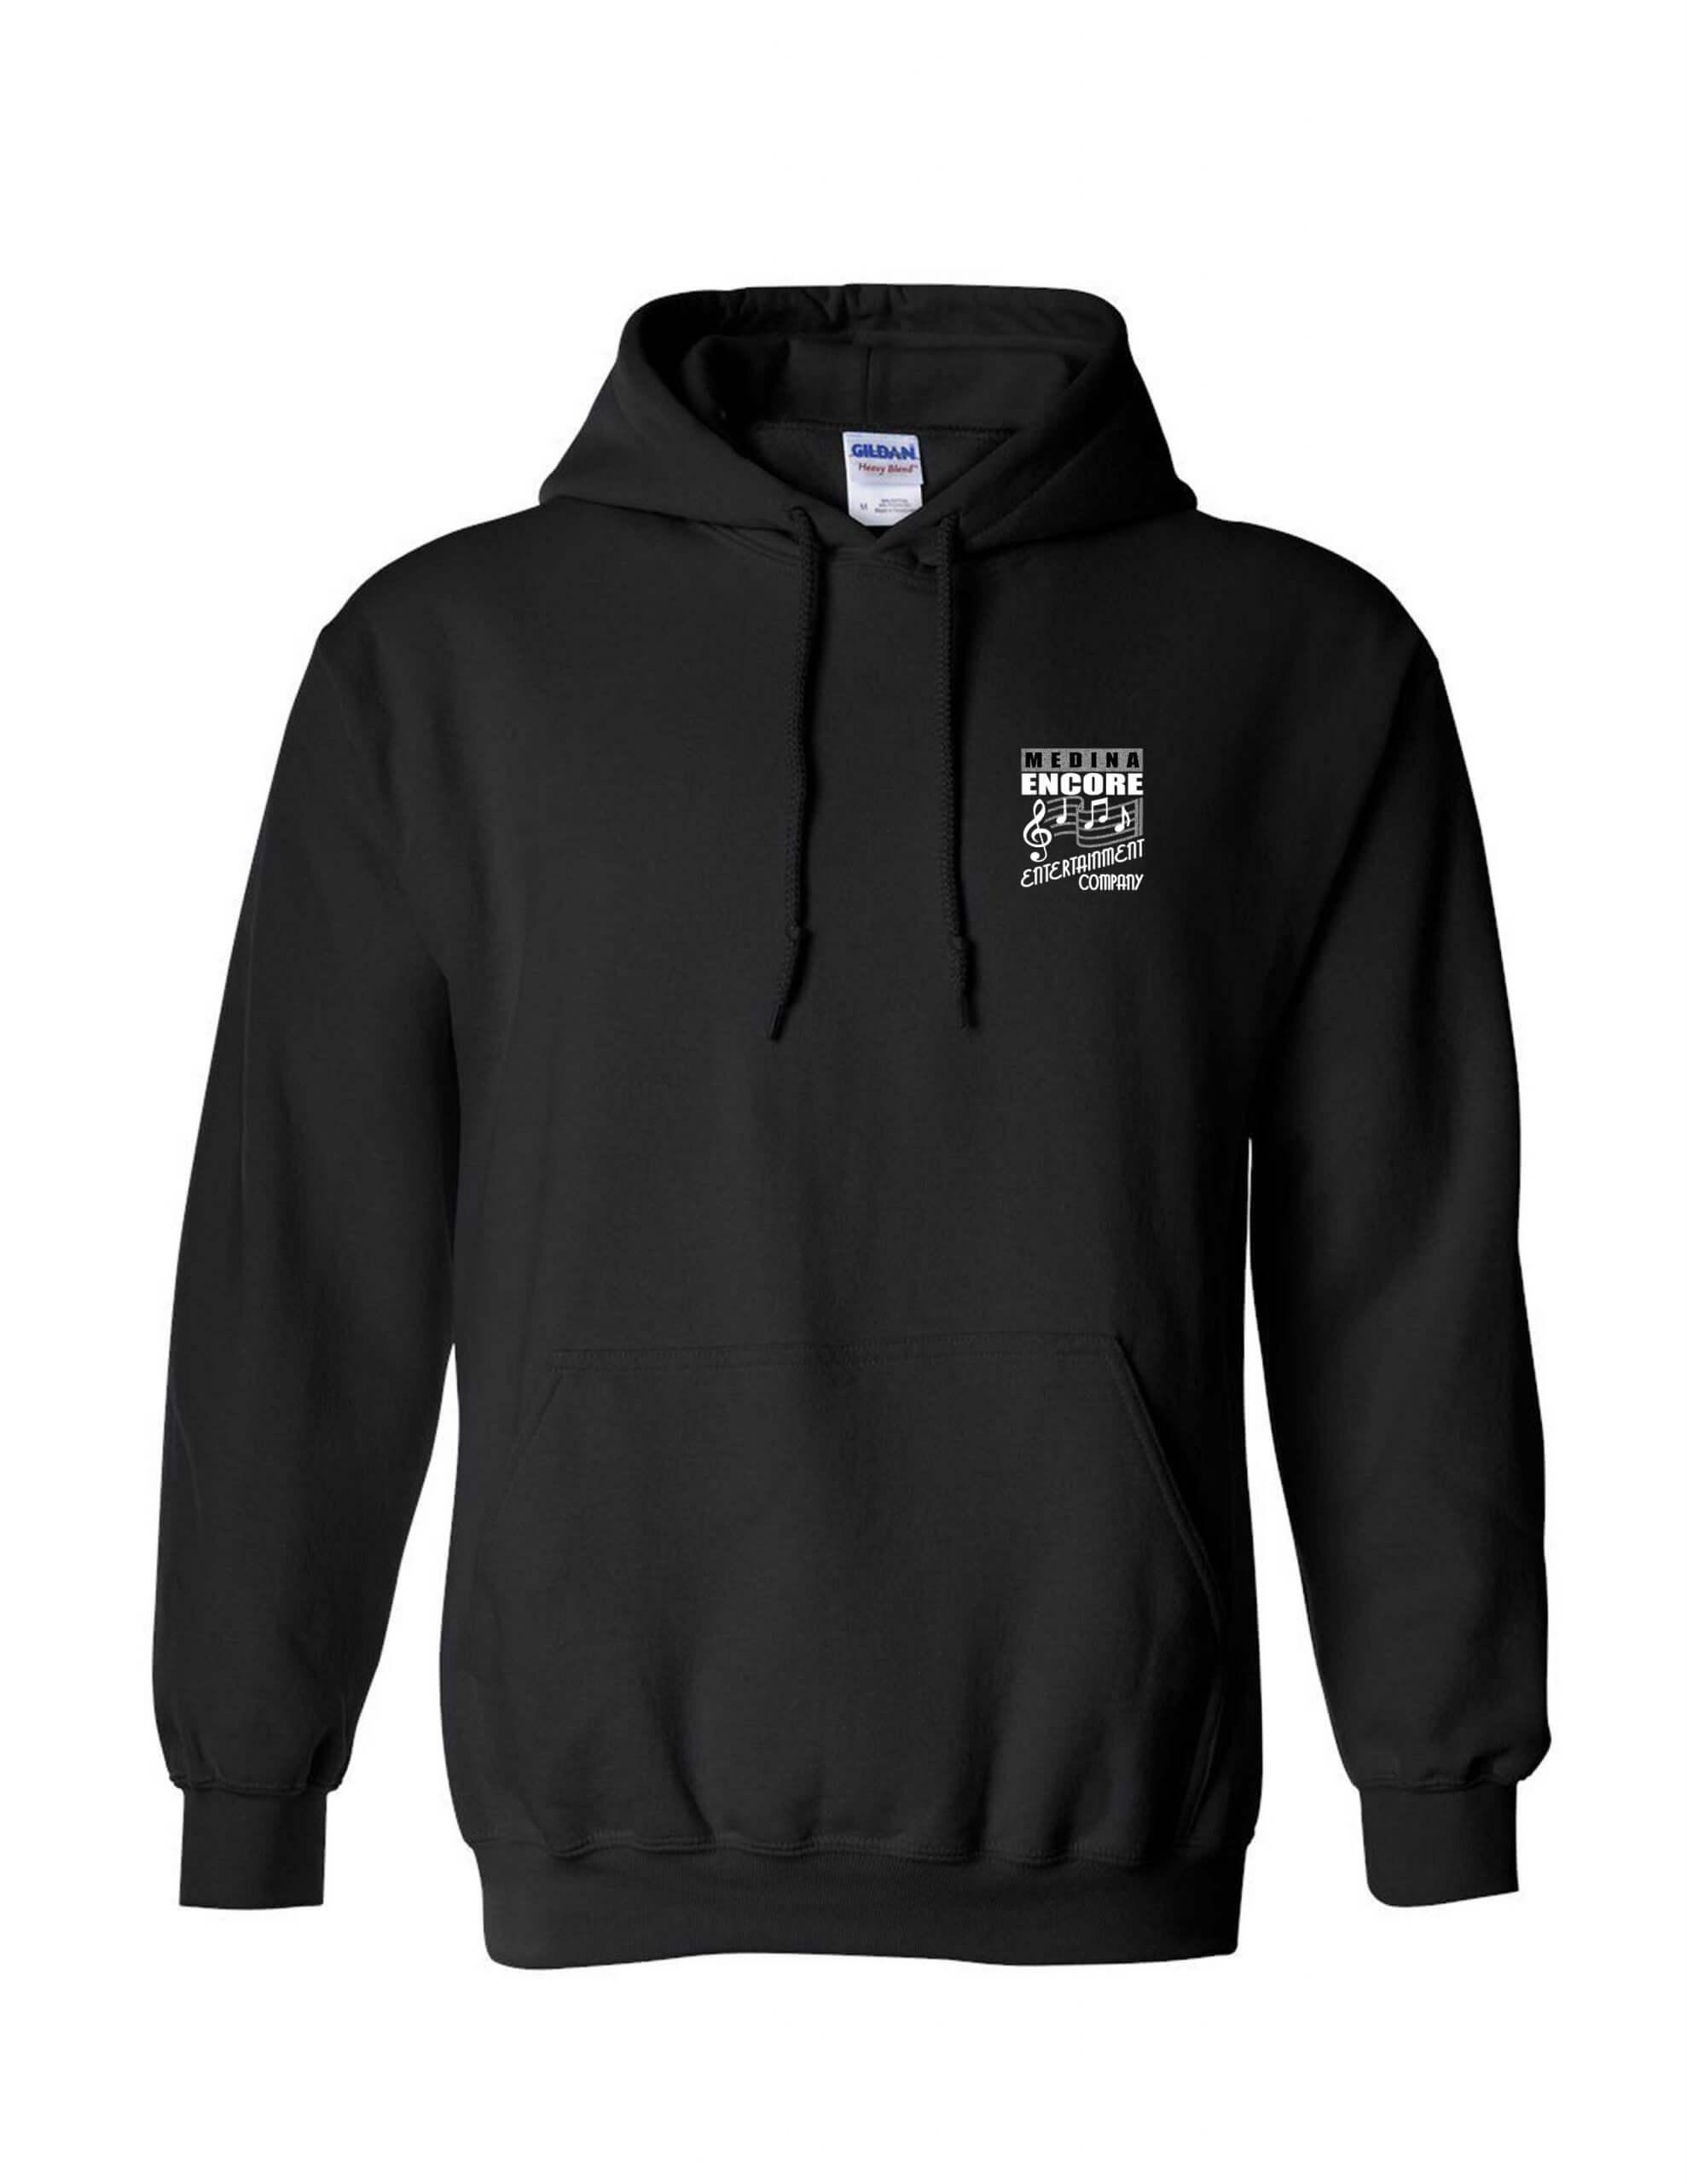 Encore Hooded Sweatshirt